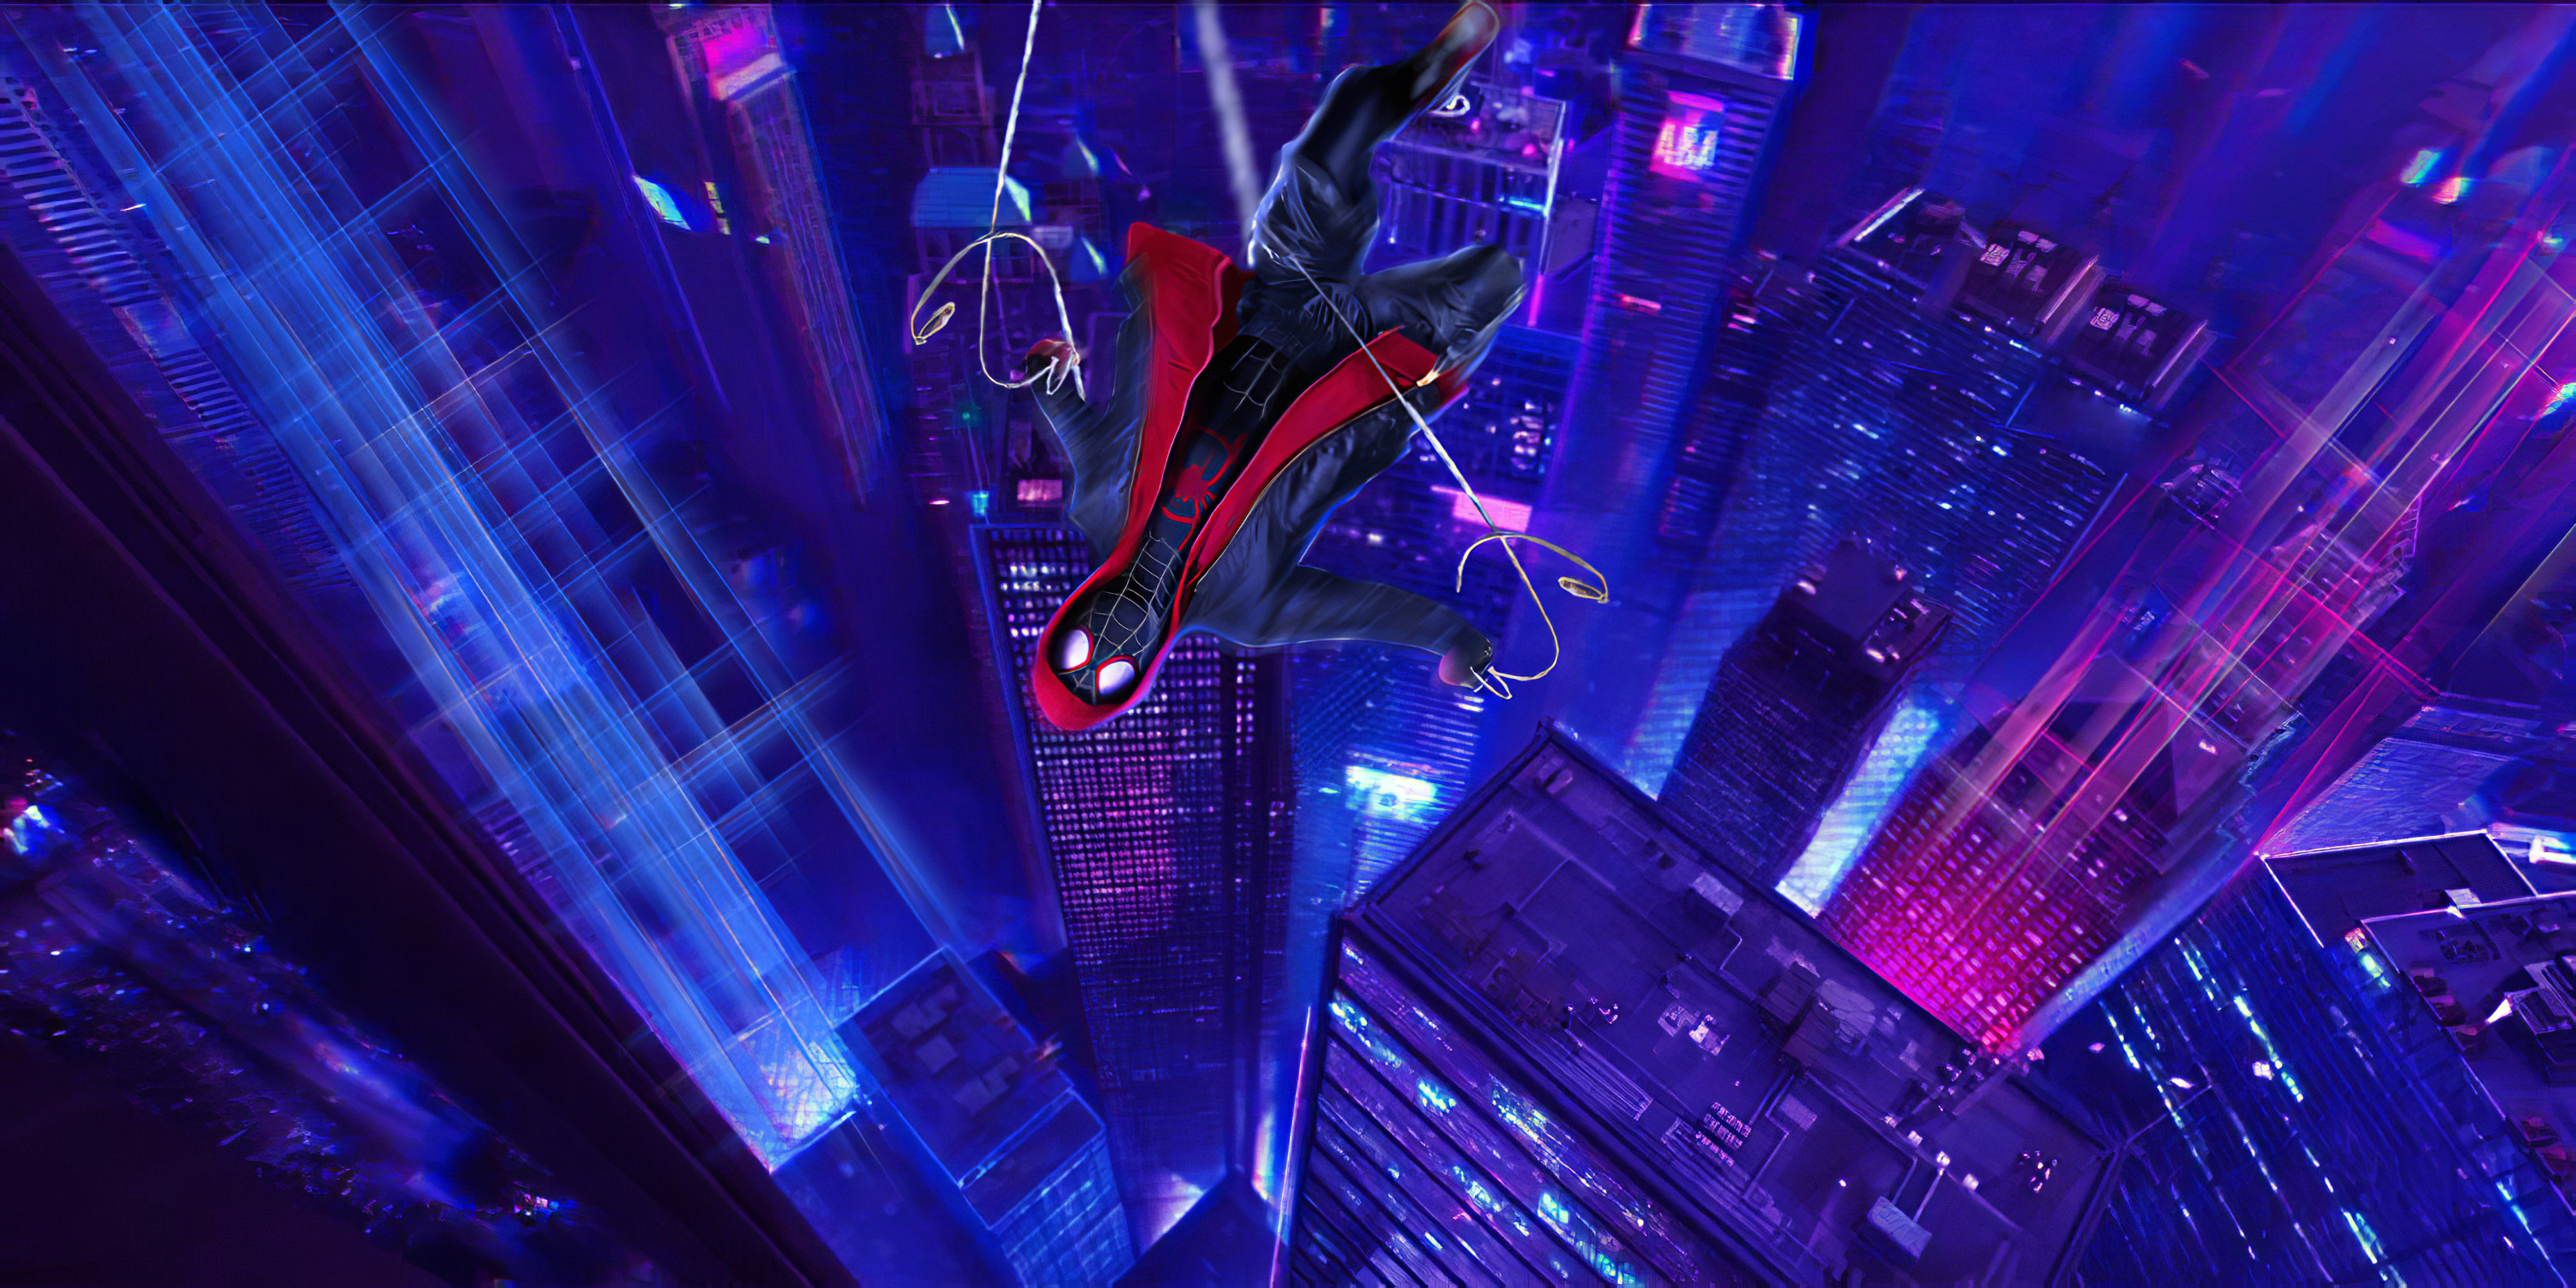 Fondos de pantalla El hombre araña cayendo en edificios